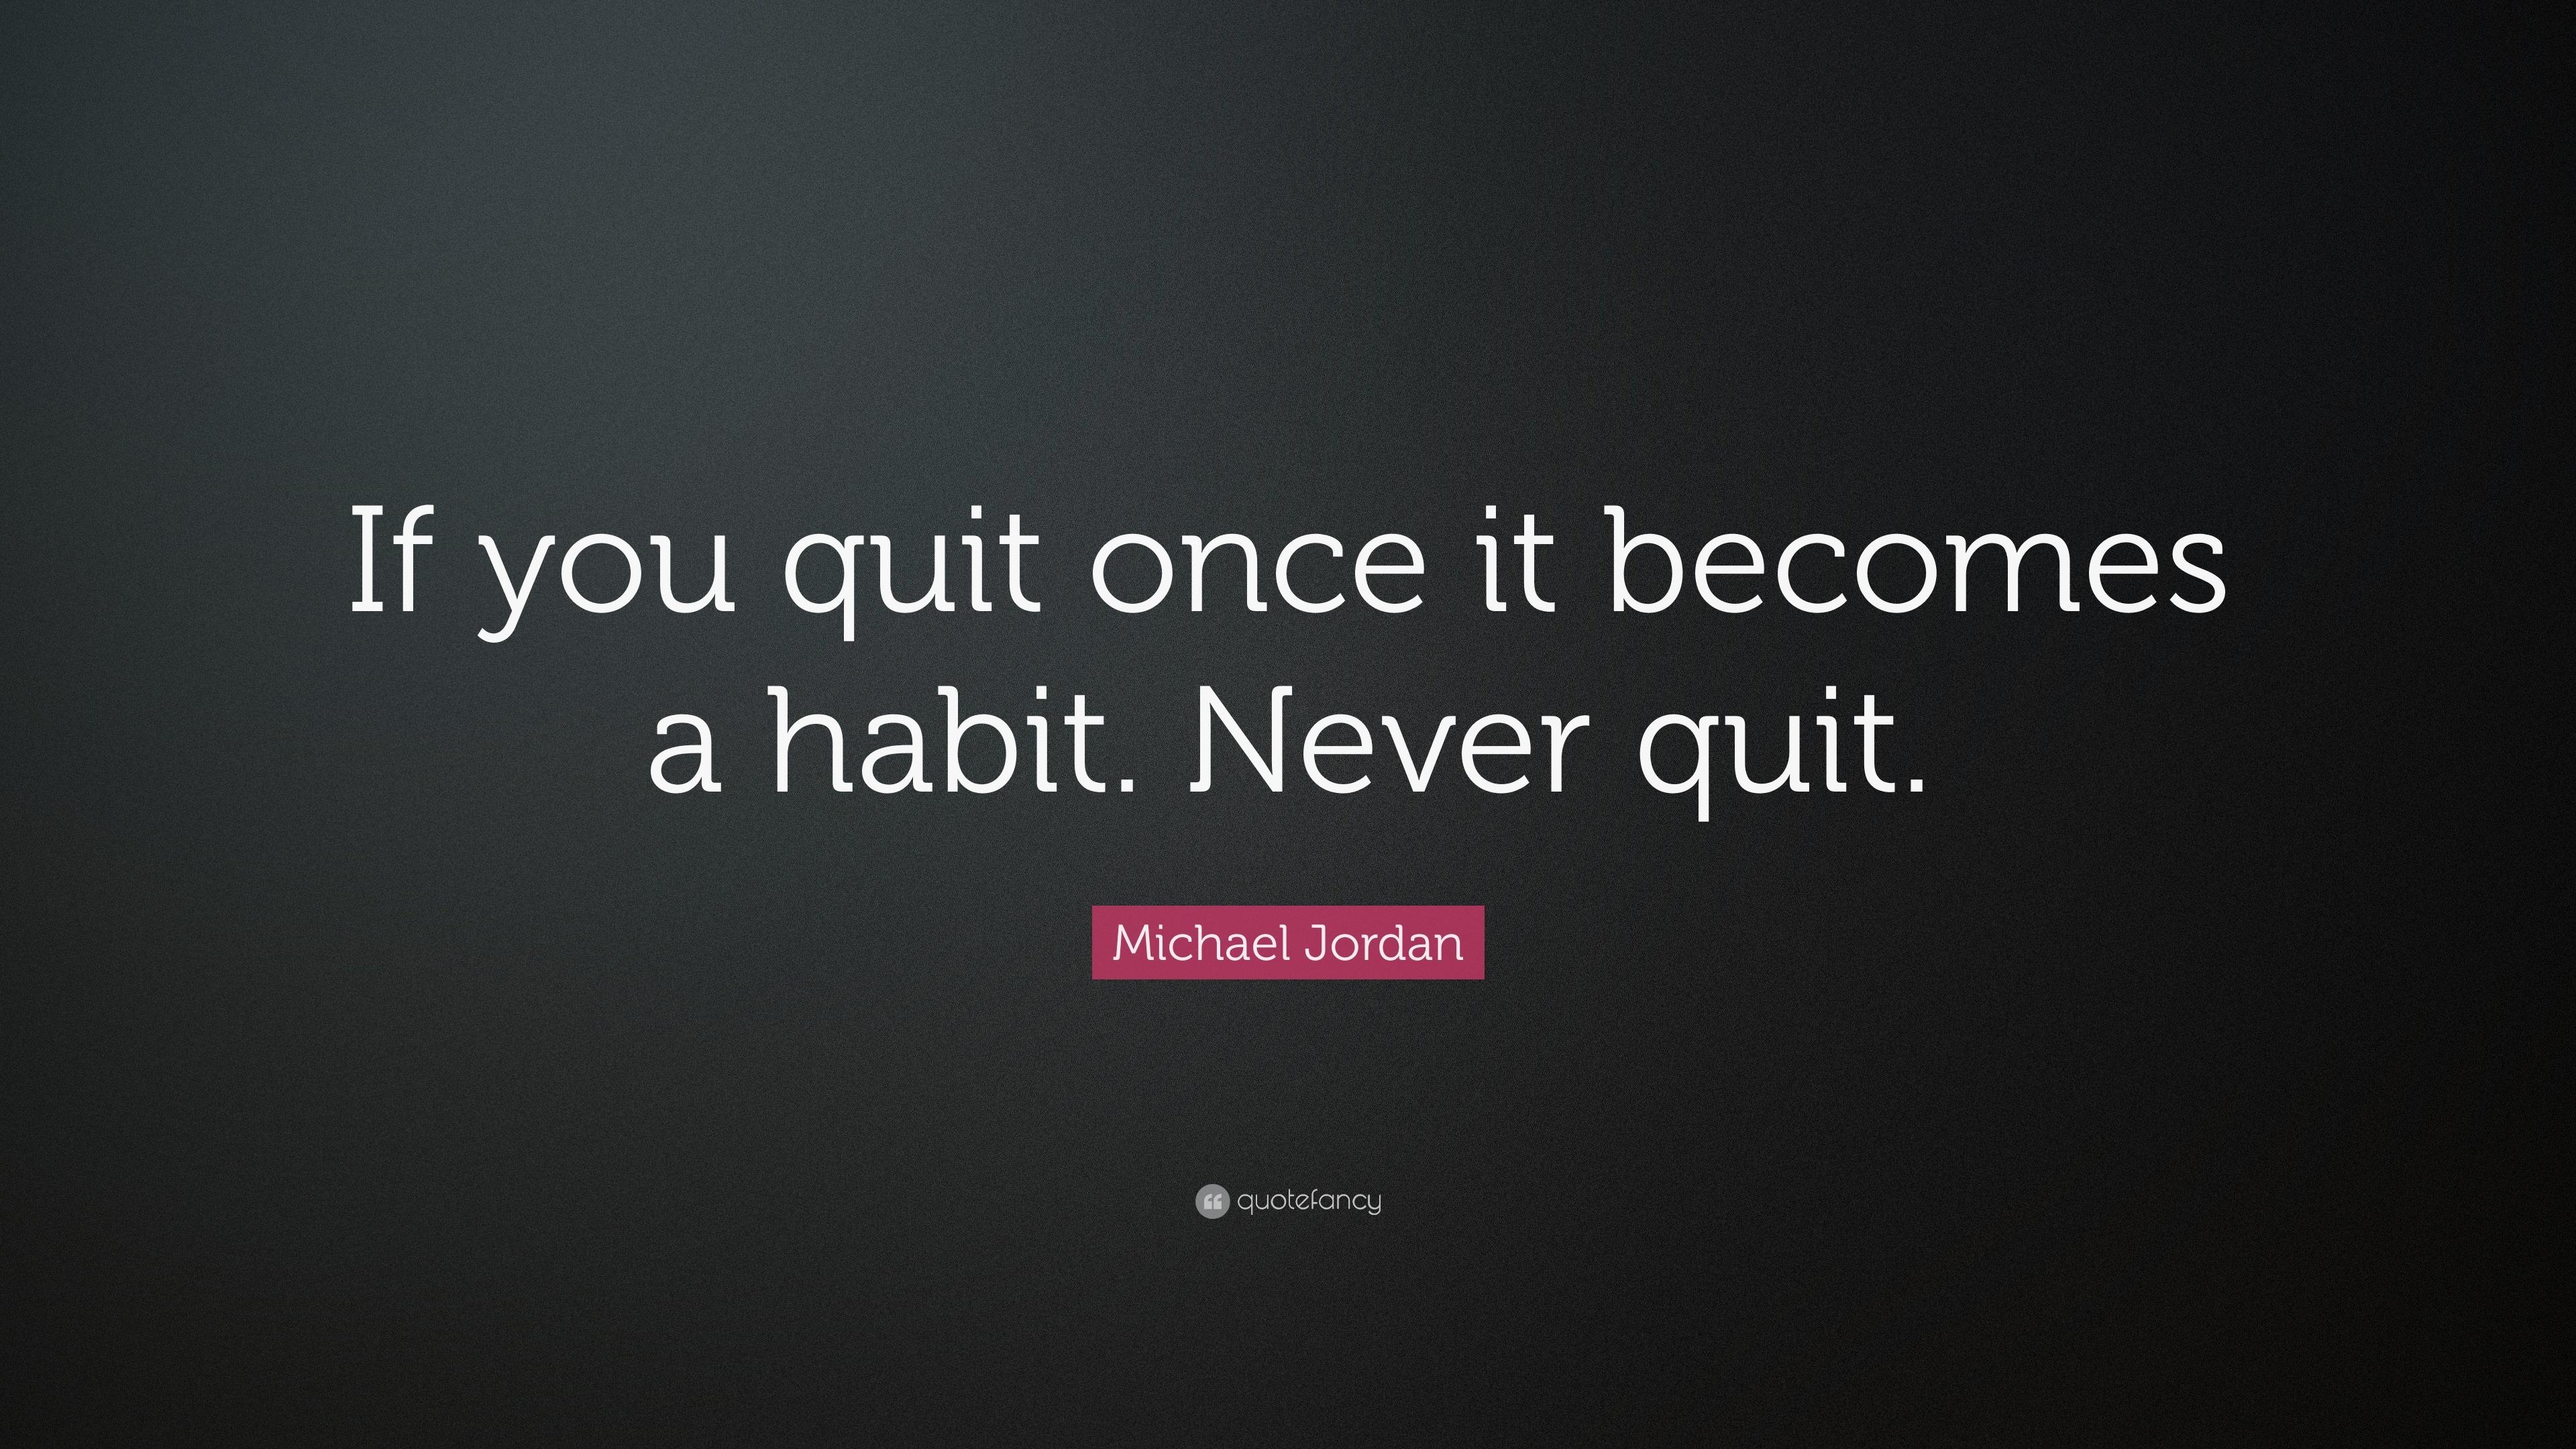 Motivation Business Quotes Wallpaper Hd Desktop Michael Jordan Quote If You Quit Once It Becomes A Habit